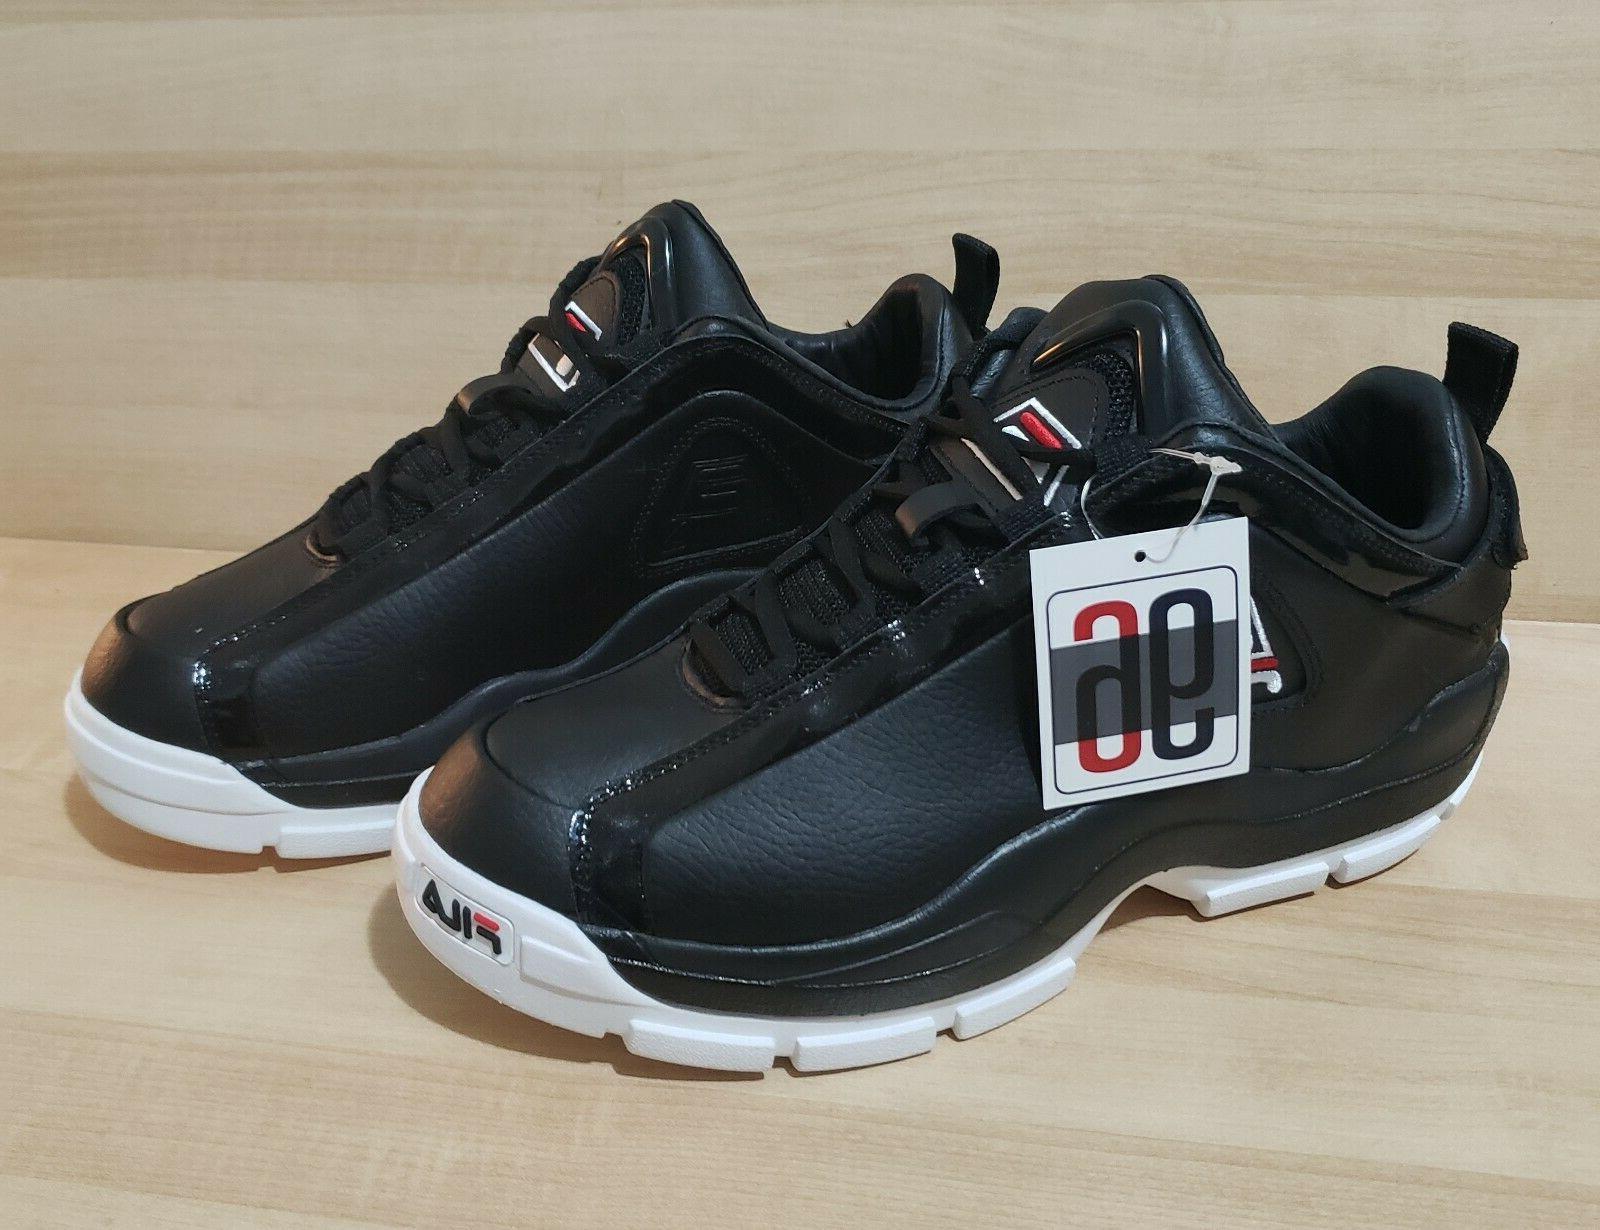 HILL Shoes 13 Black